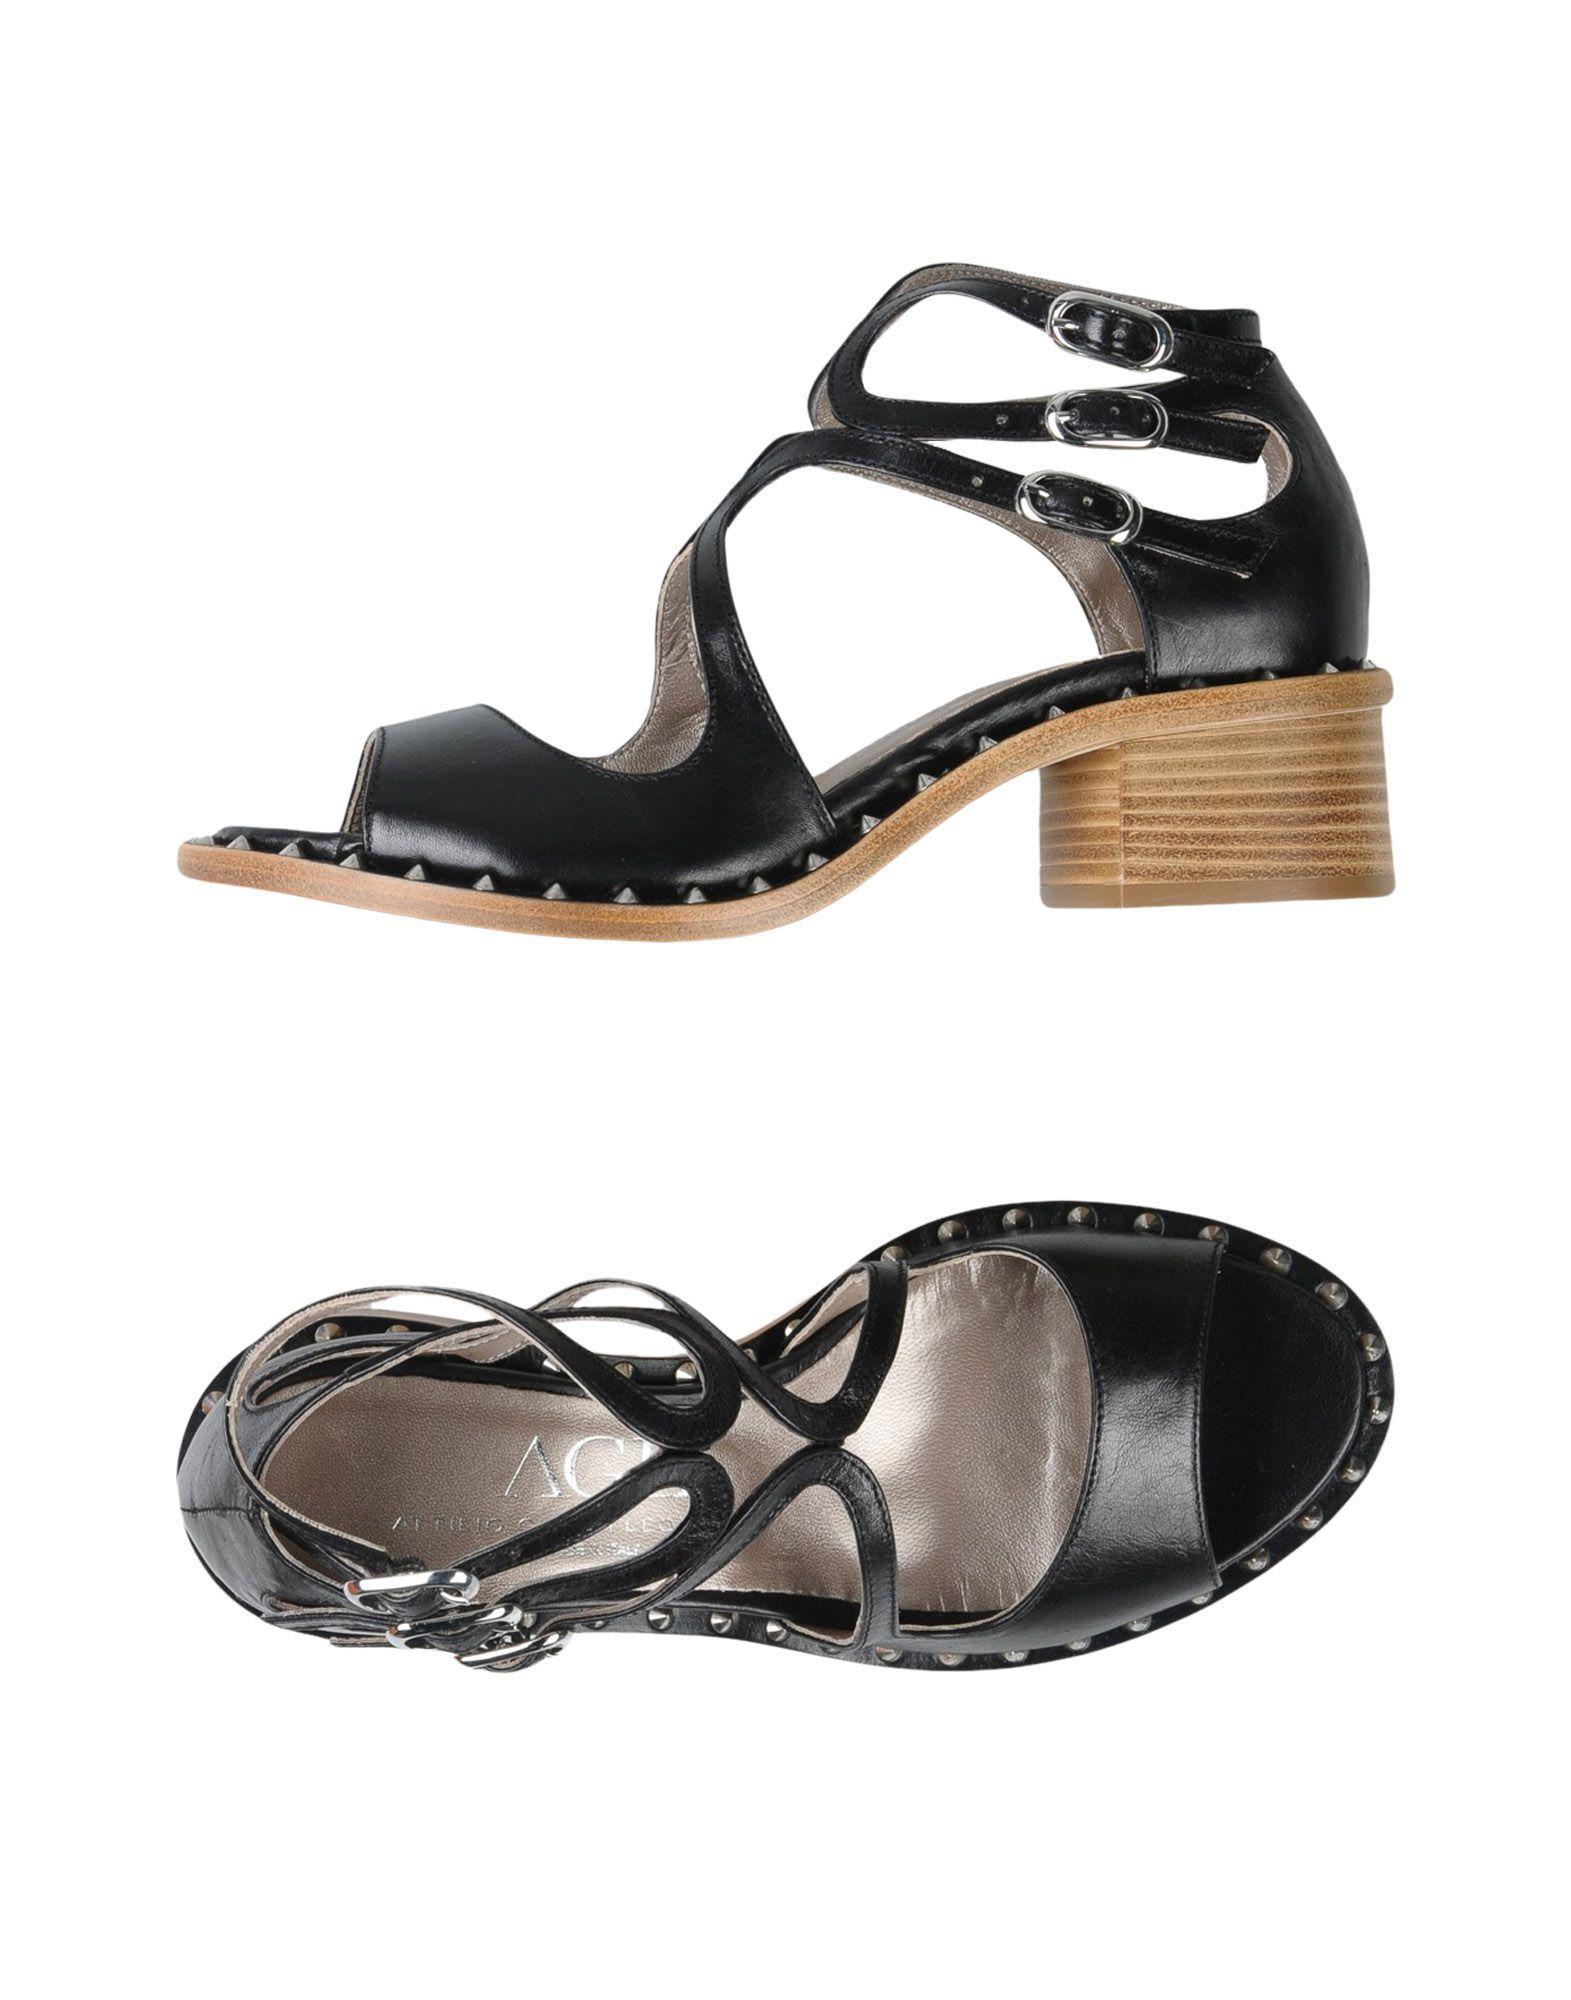 Attilio Giusti Leombruni 'Mirror' Silver Slingback Sandals sz: 38 / US 7.5 - 8